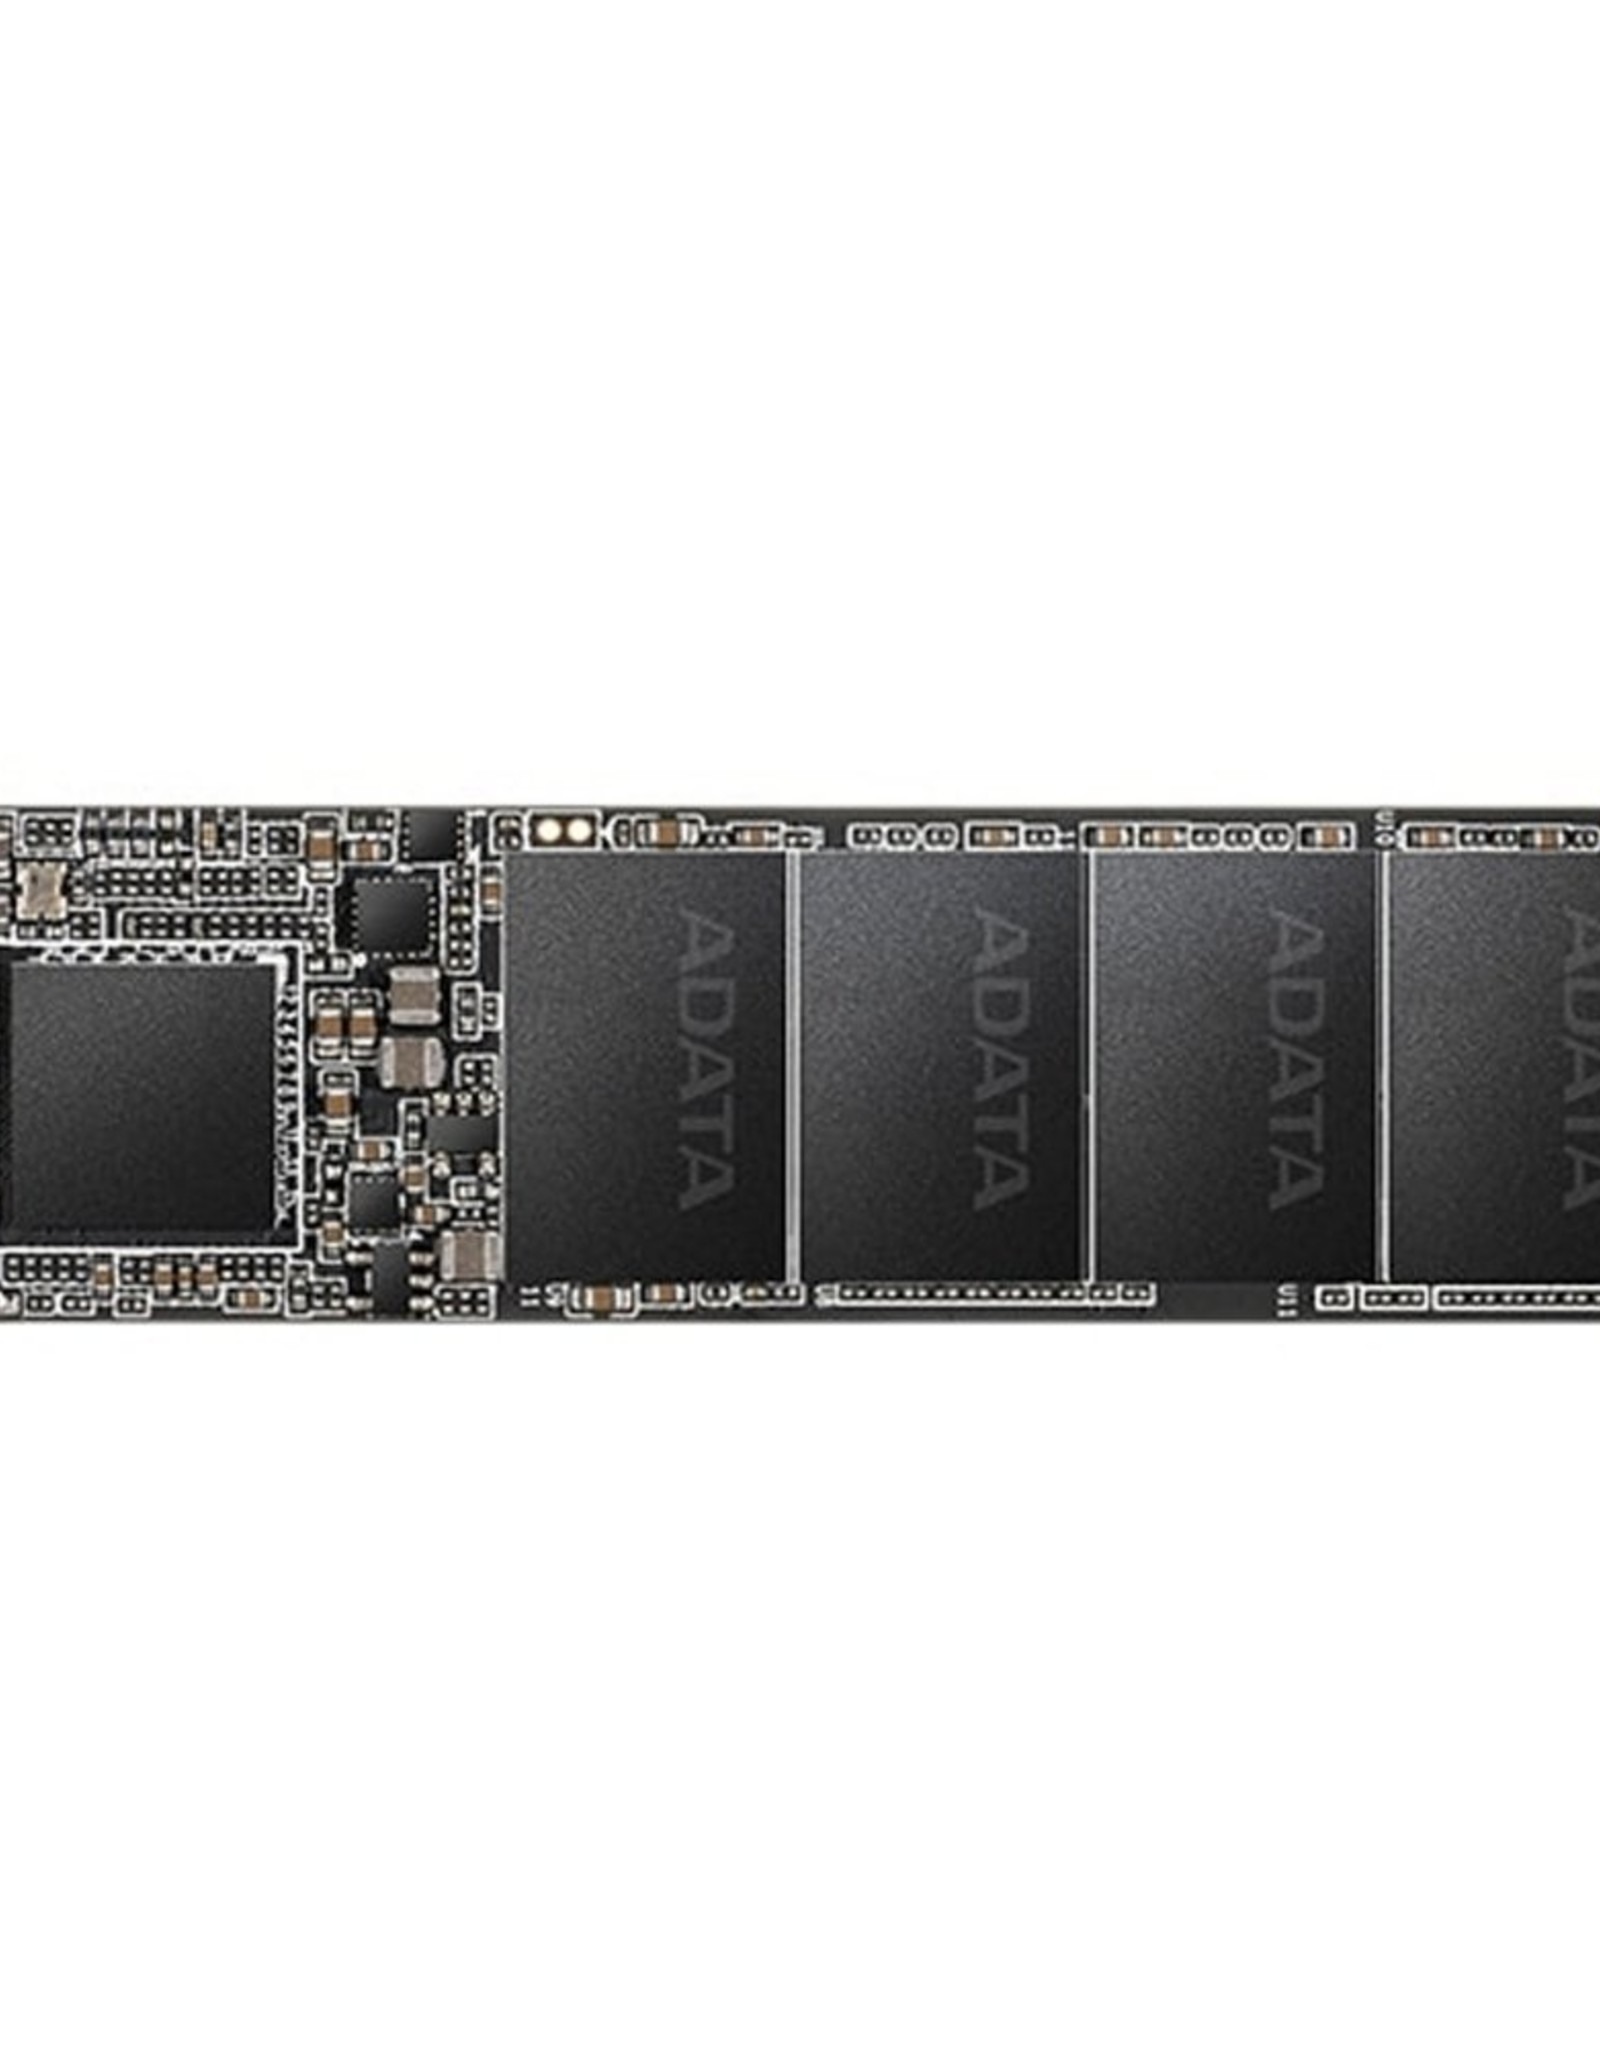 SSD 256GB NVMe 1800MB/s read 900/MB/s